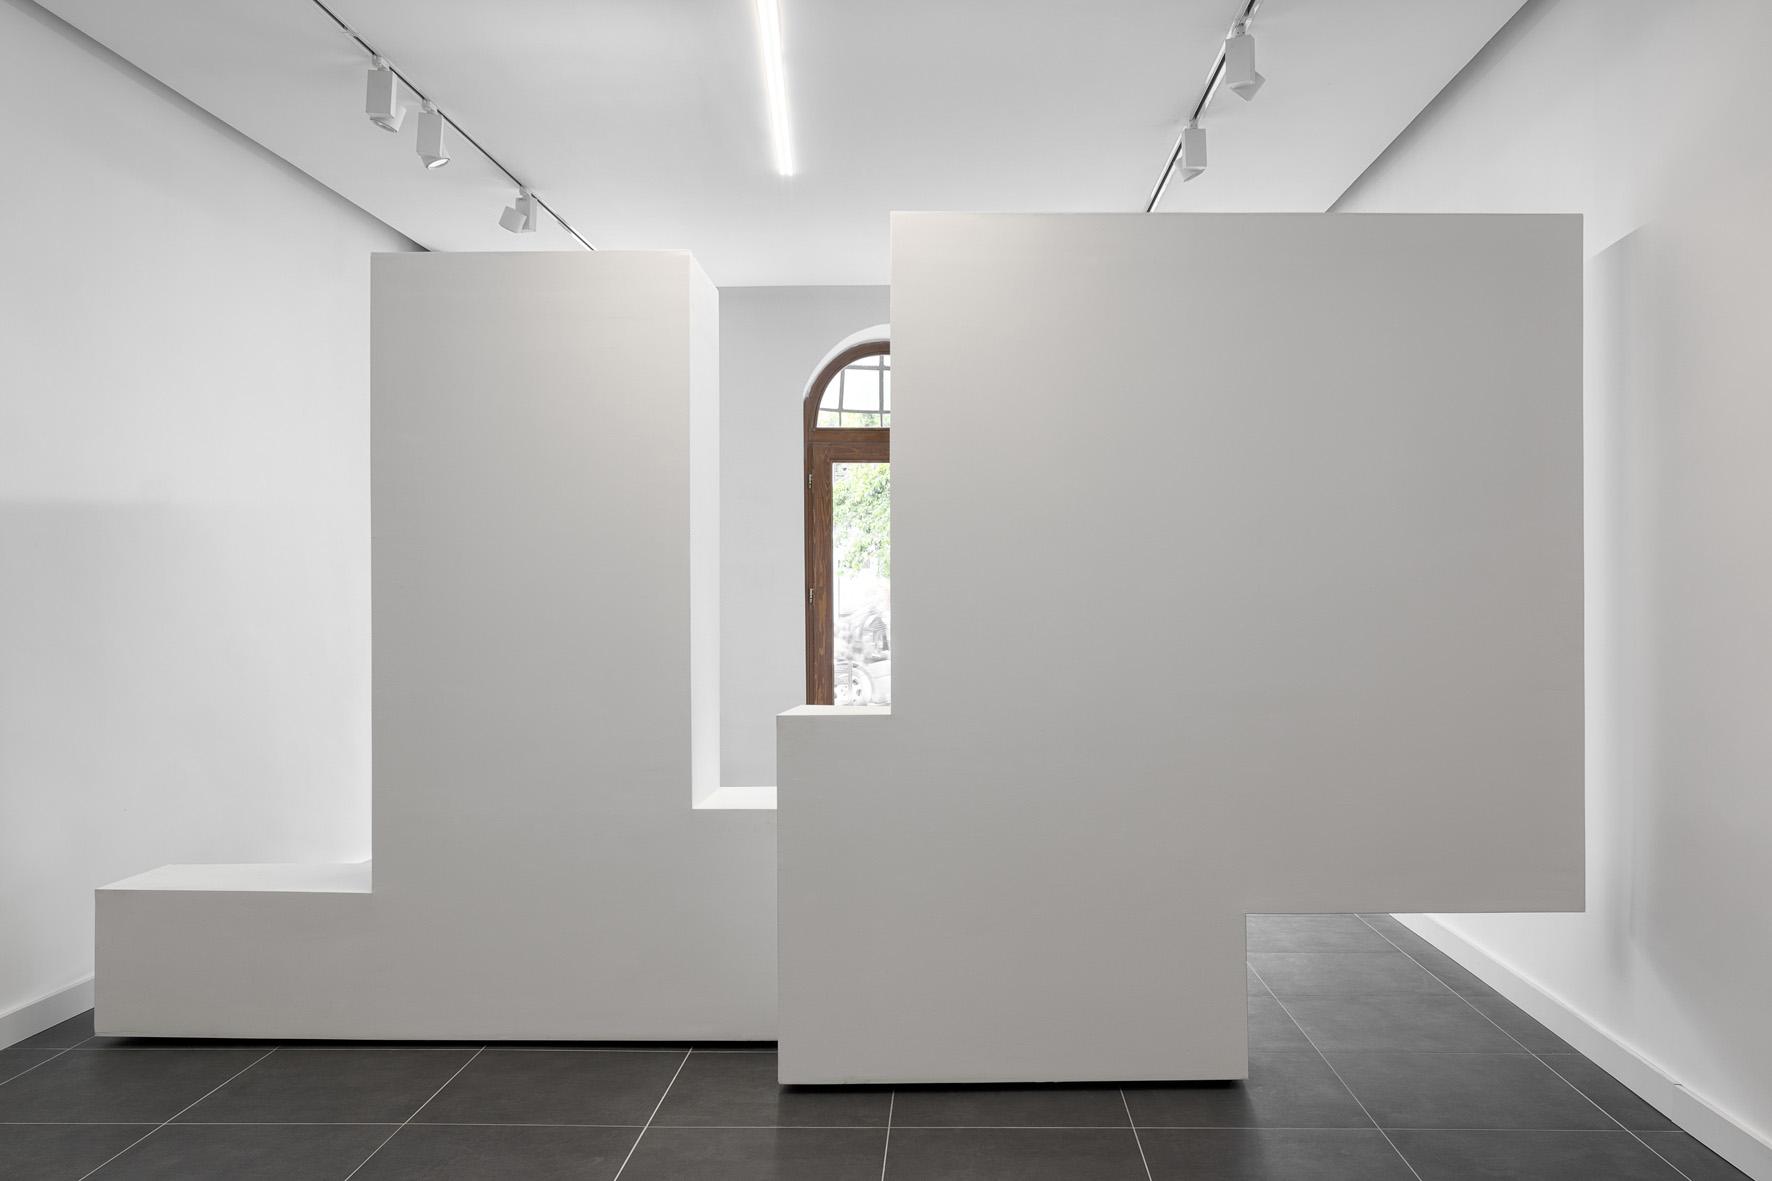 13 Priznanje Enterijer Aleksandar Gušić Architecture - Galerija moderne umetnosti  1